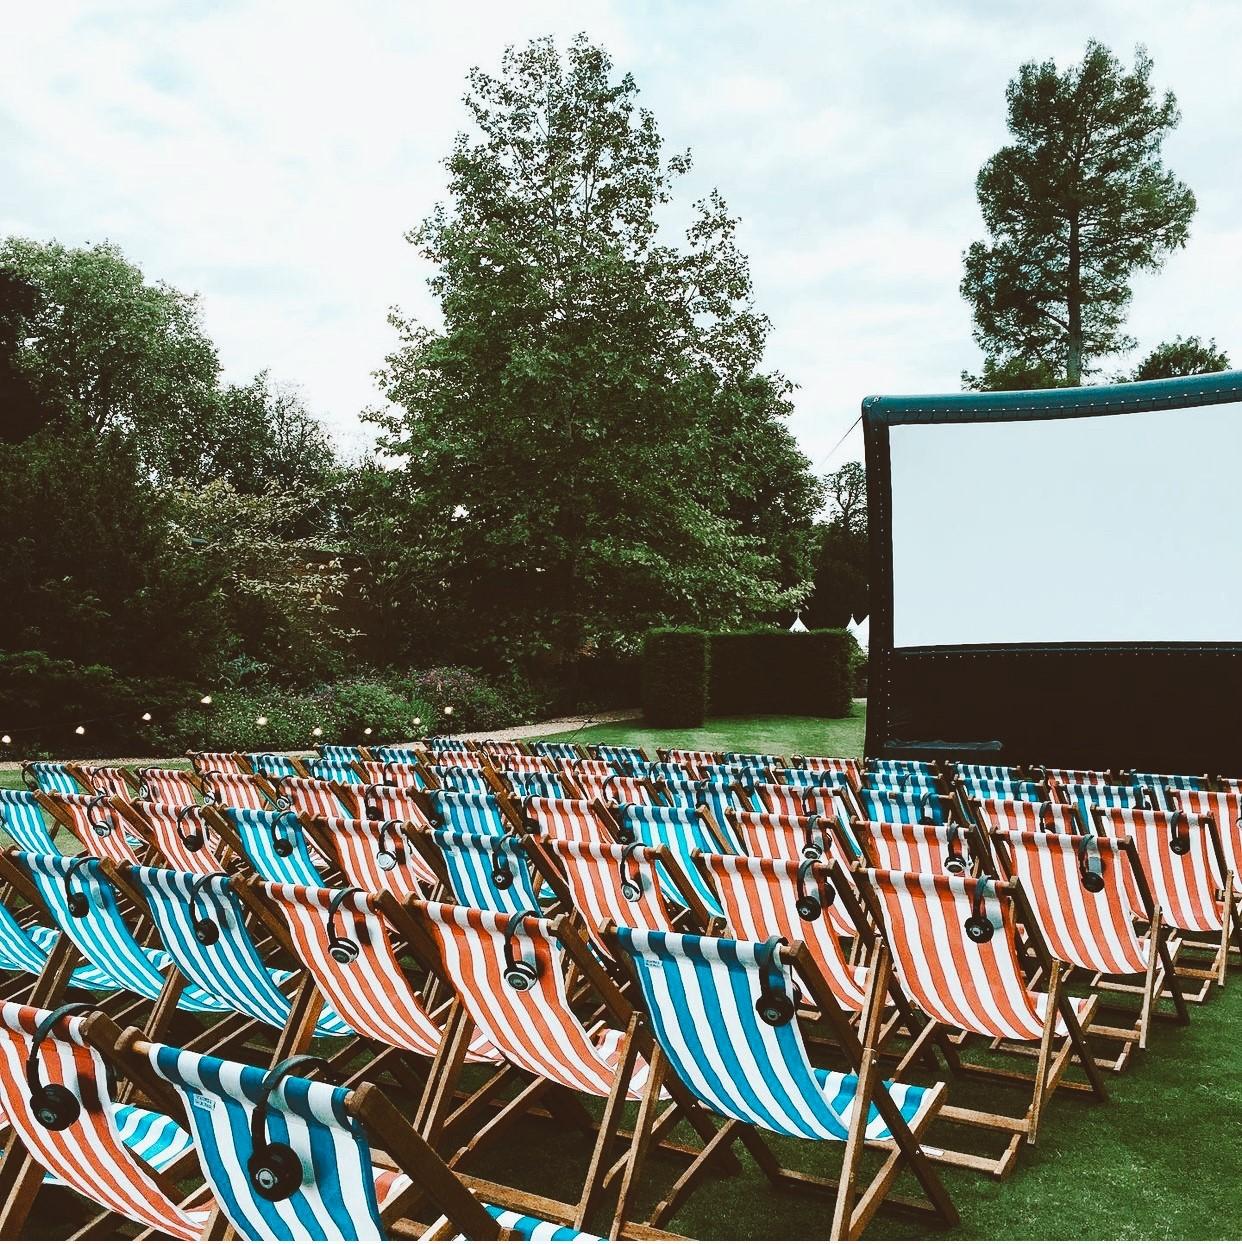 An outdoor cinema